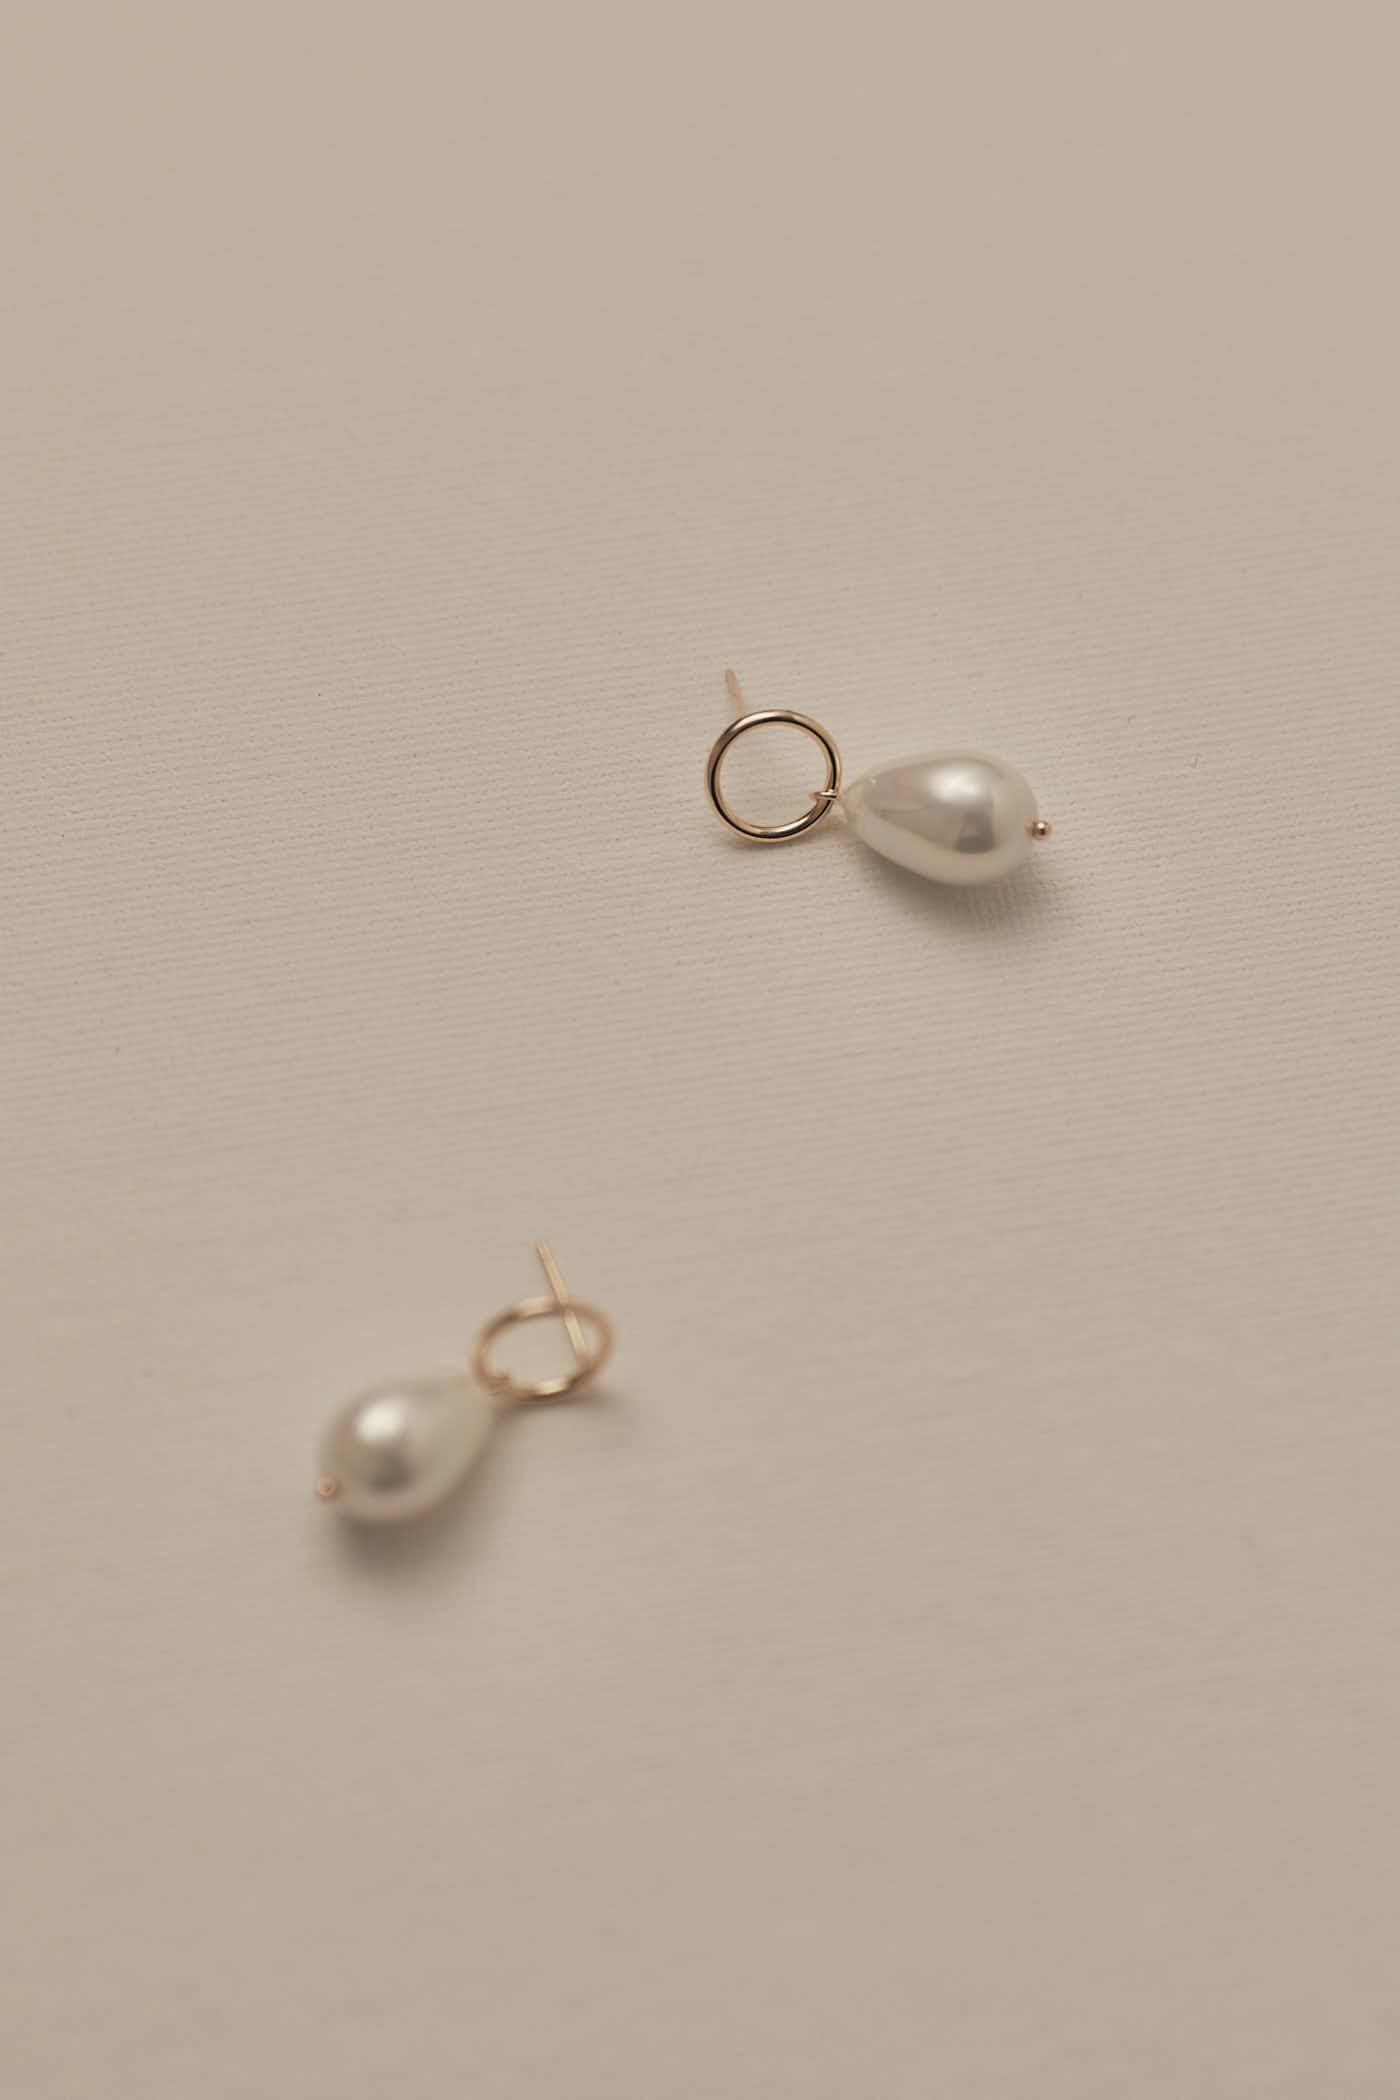 Lorne Pearl Earrings